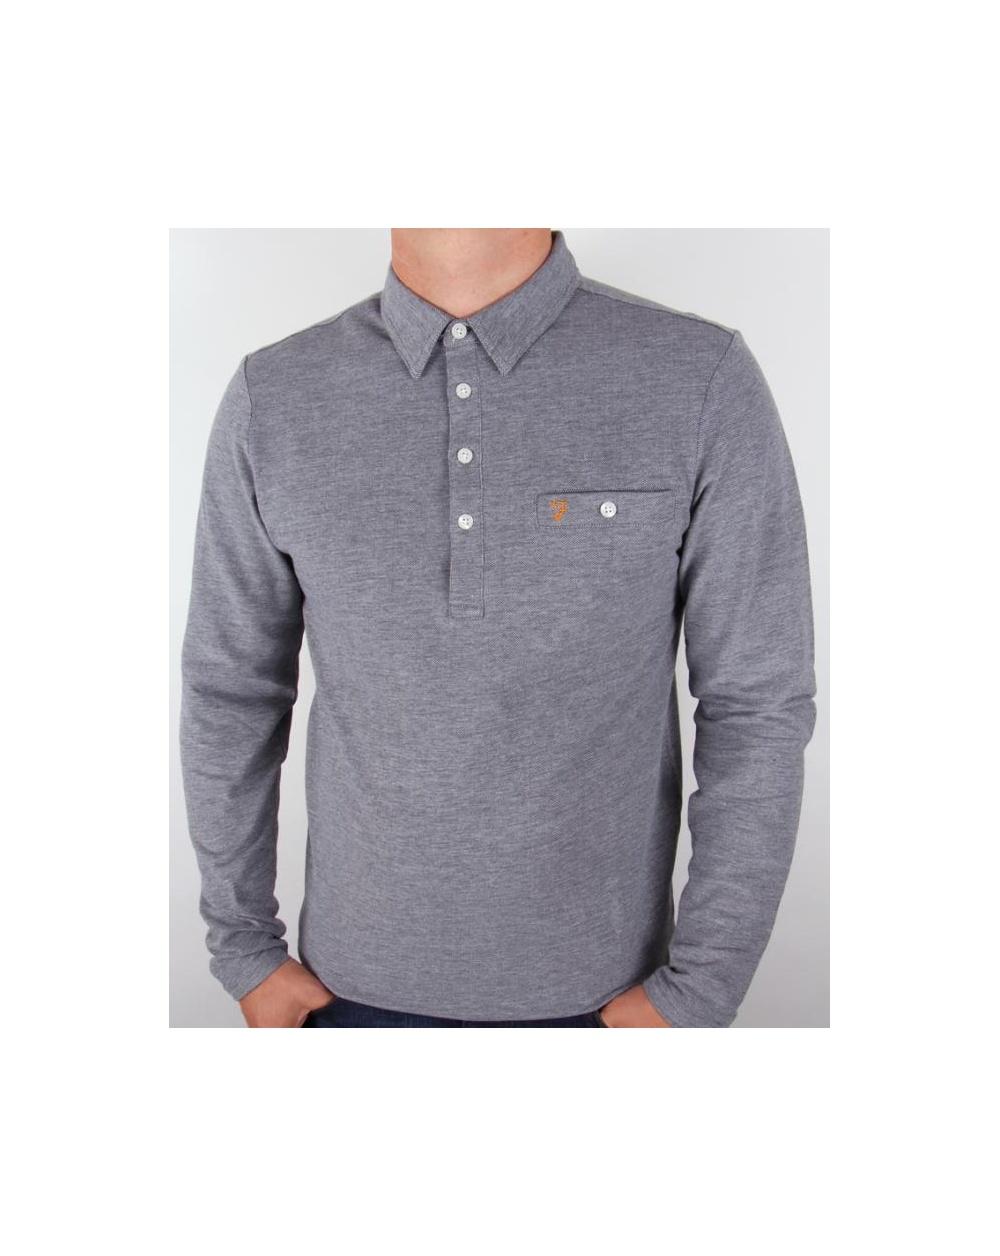 Farah Tennyson L/s Polo Shirt True Navy